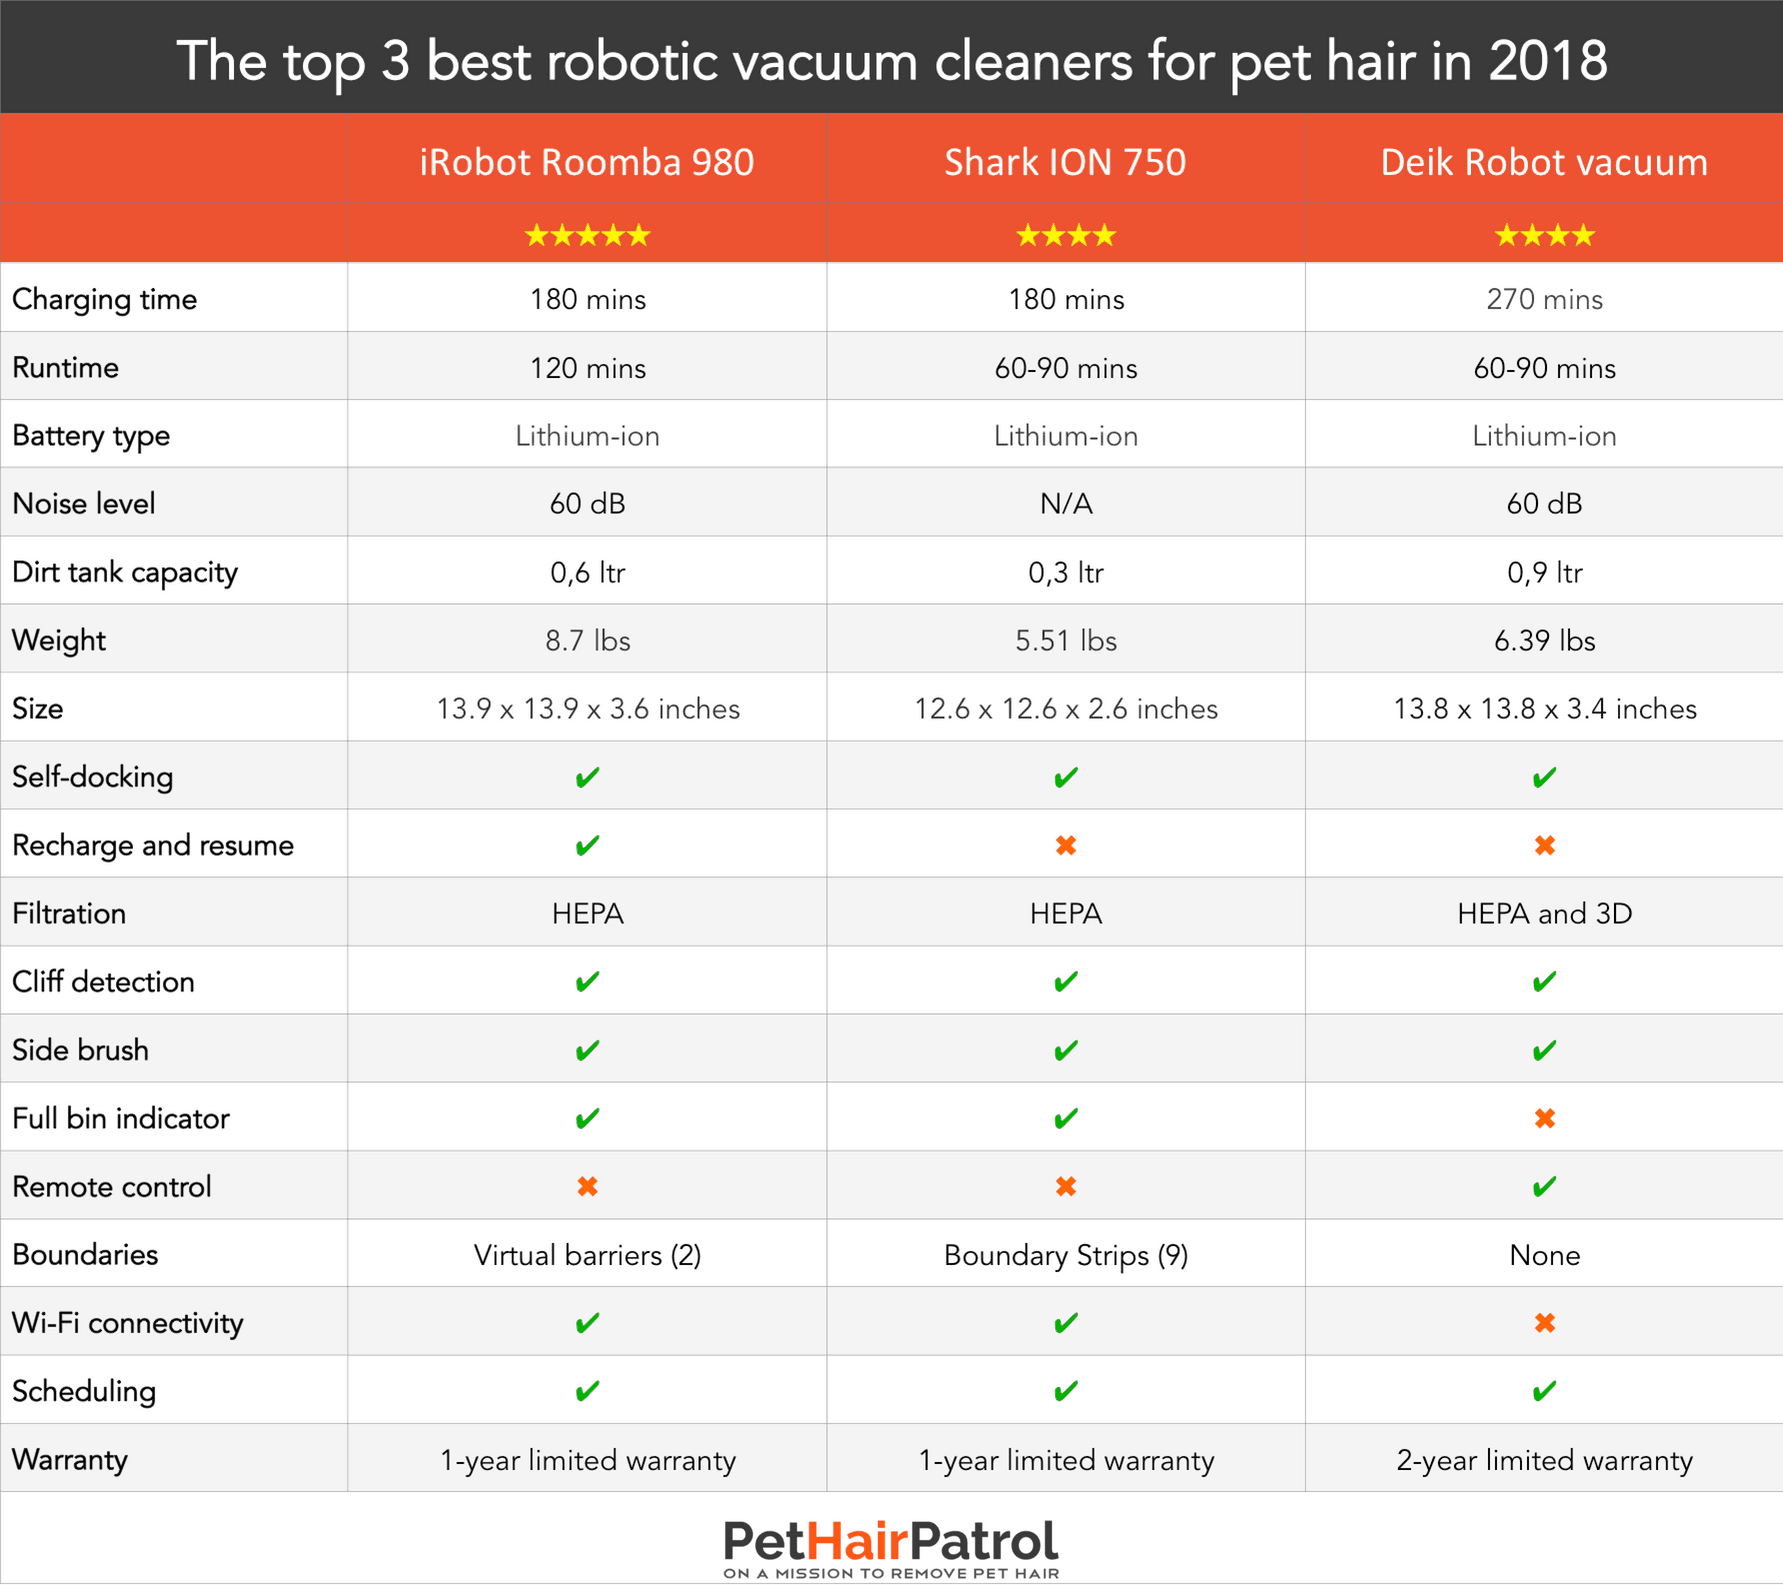 Top Robotic Vacuum Cleaners for pet hair in 2018